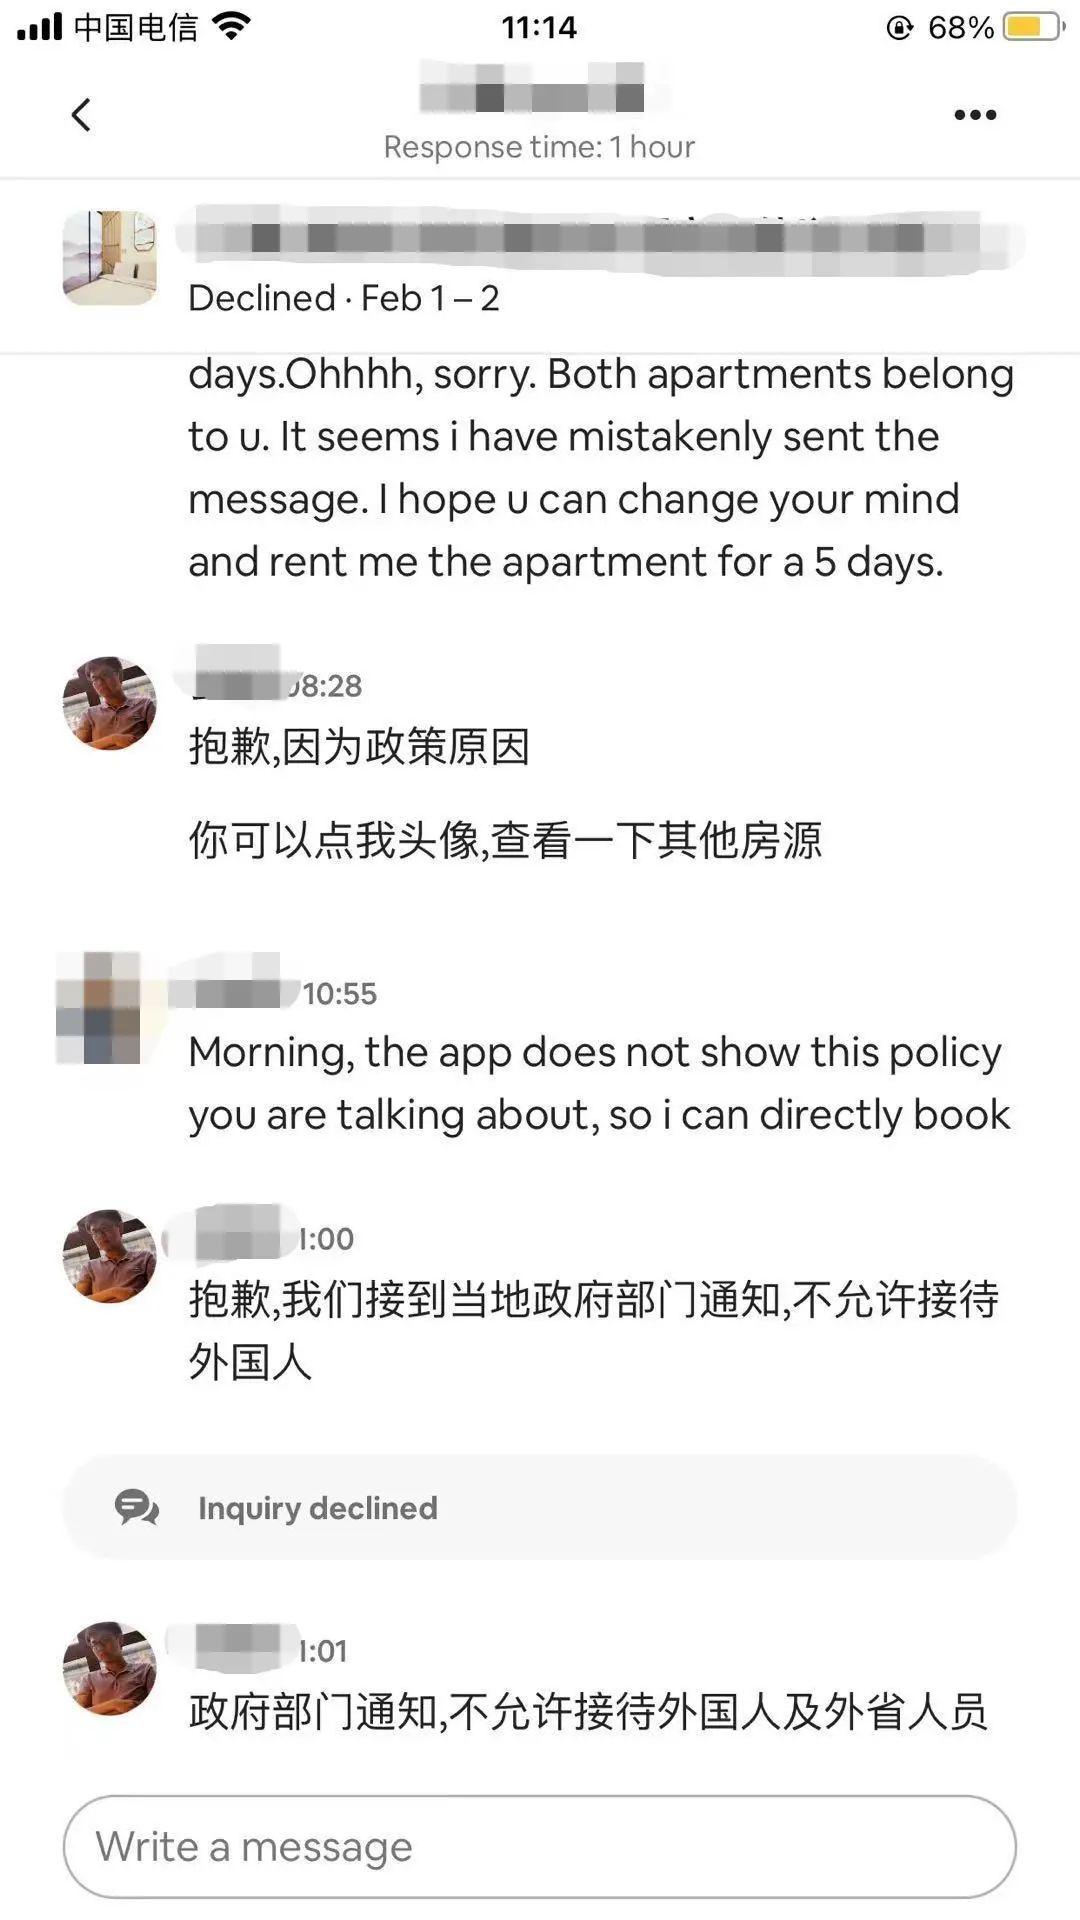 Abolish Such Bias Against 外国人 - An Airbnb Situation